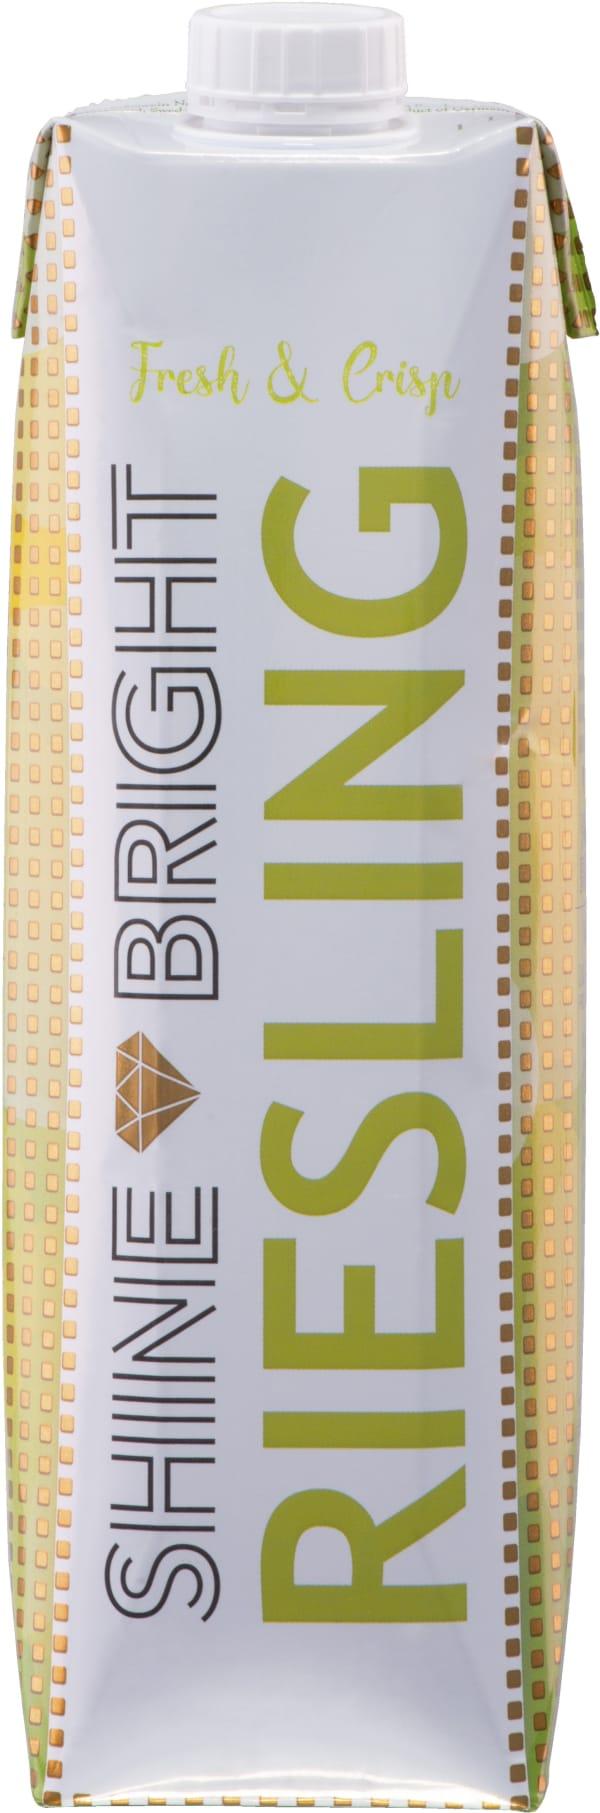 Shine Bright 2020 carton package